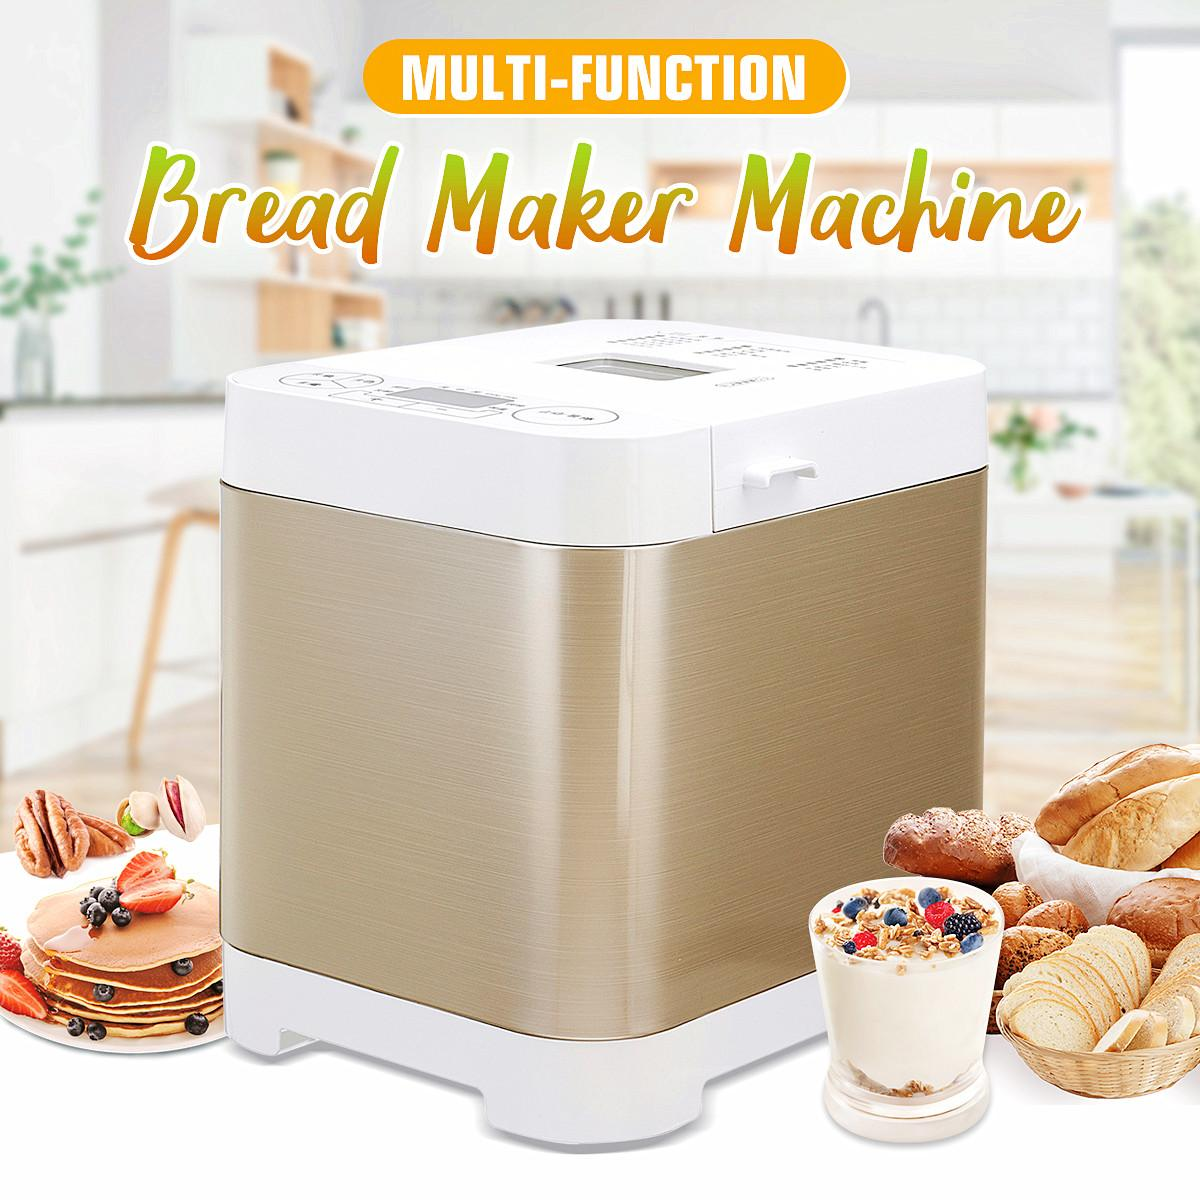 New 450W Mini Multifunction Bread Maker Automatic Intelligent Bread Baking Home Diy Yogurt Maker Machine Household Cooking Tools